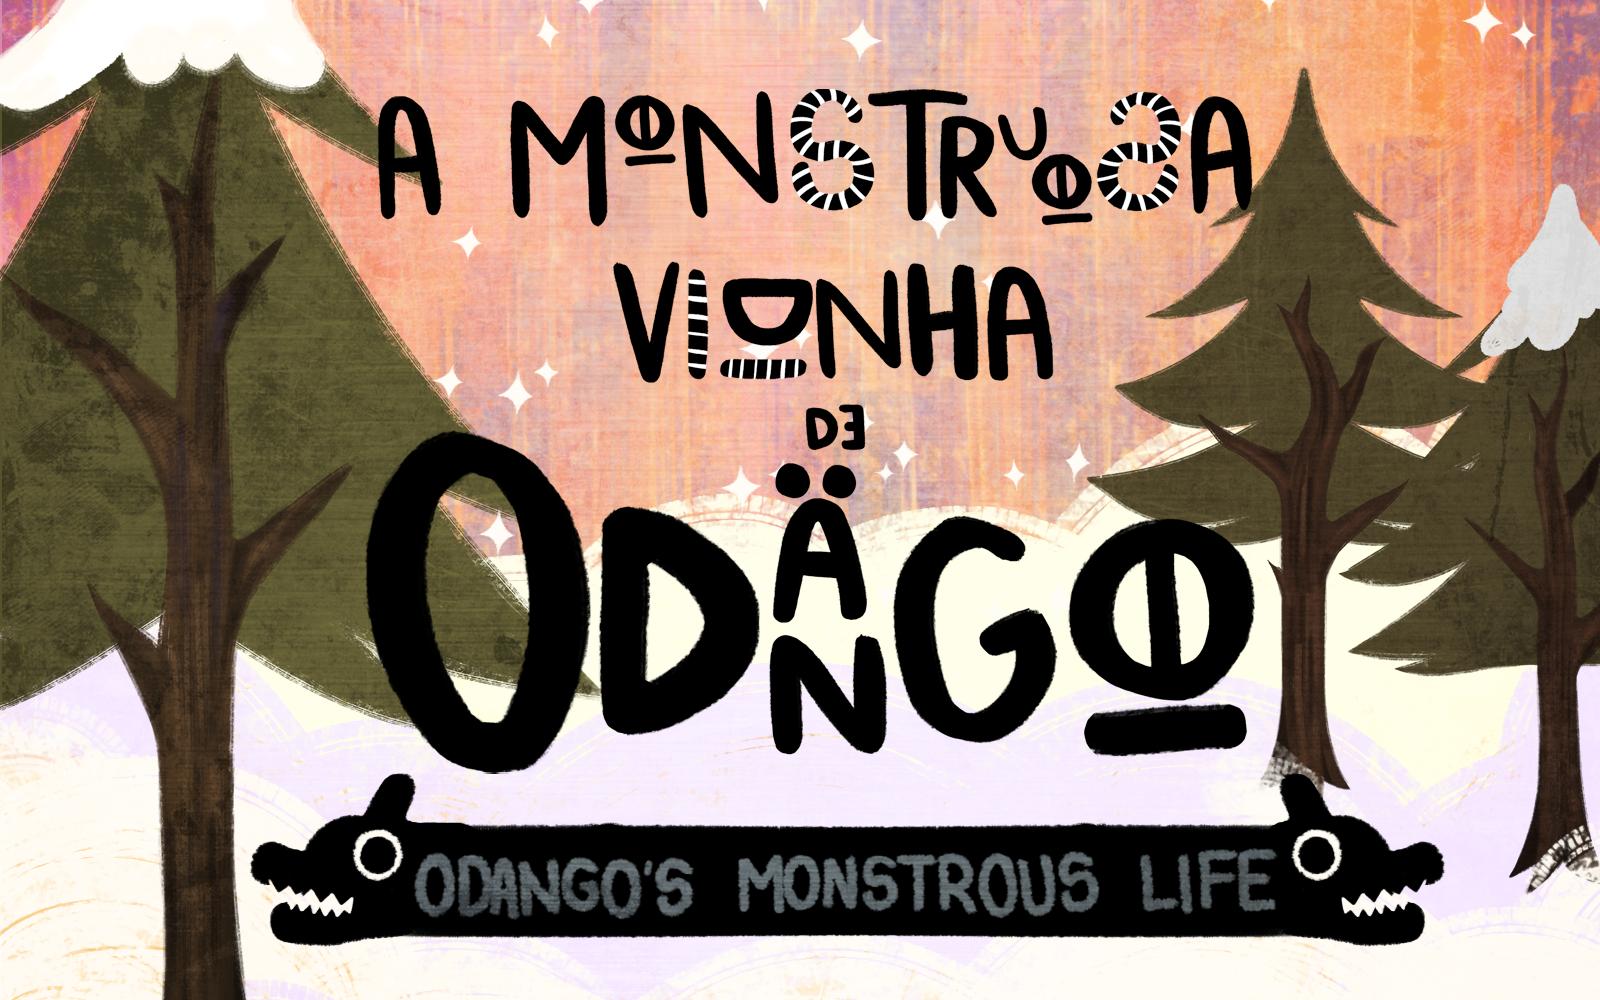 Odango's Monstrous Life